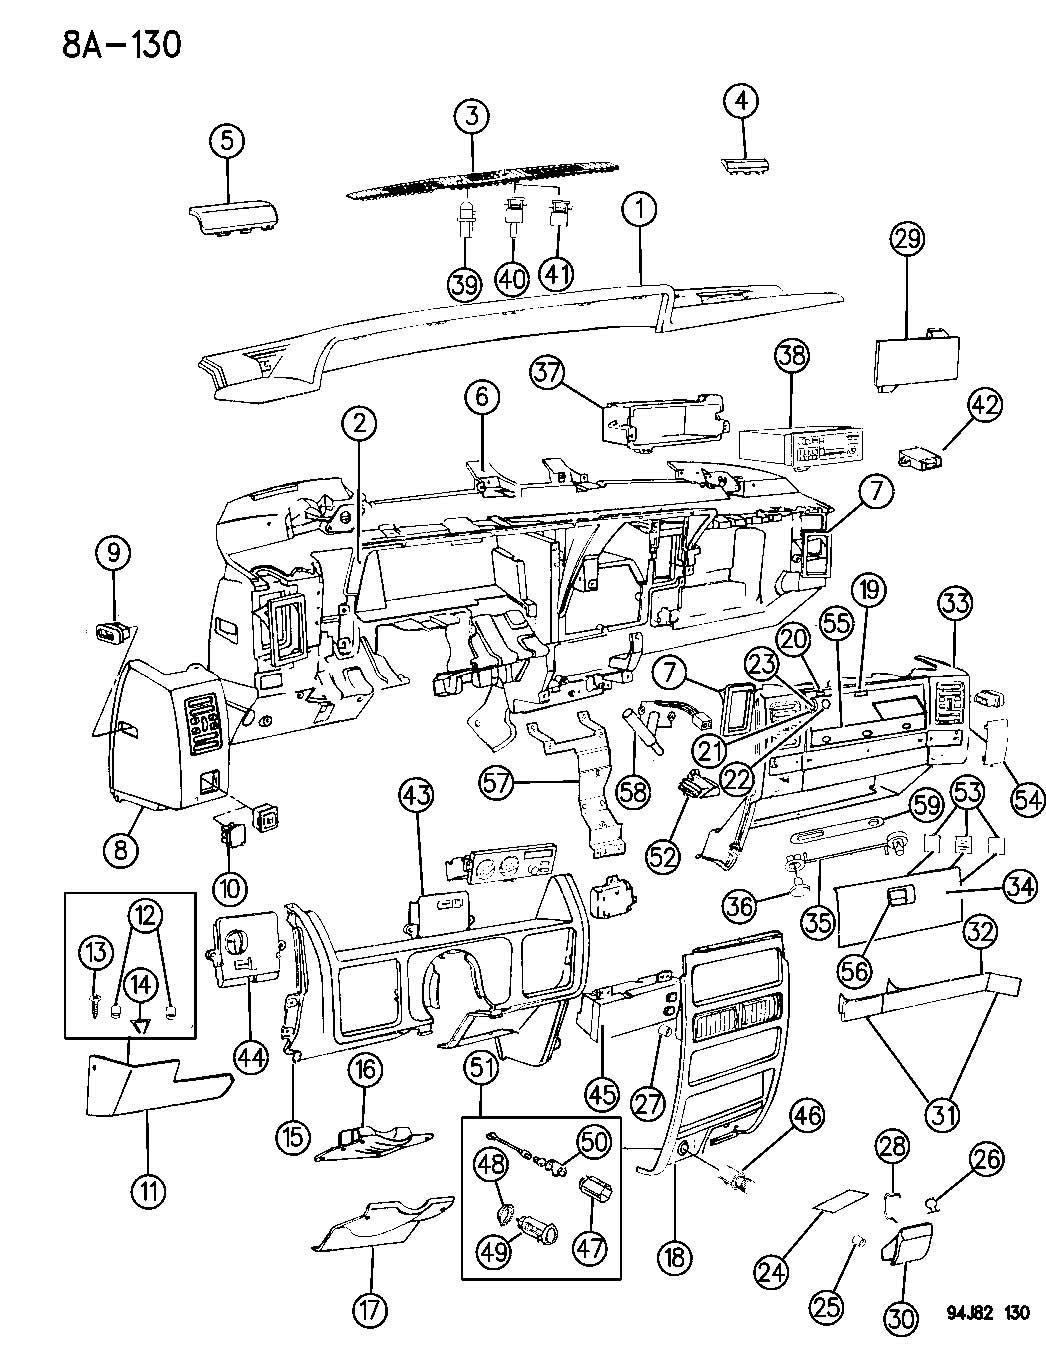 Jeep Grand Cherokee Module Graphic Display